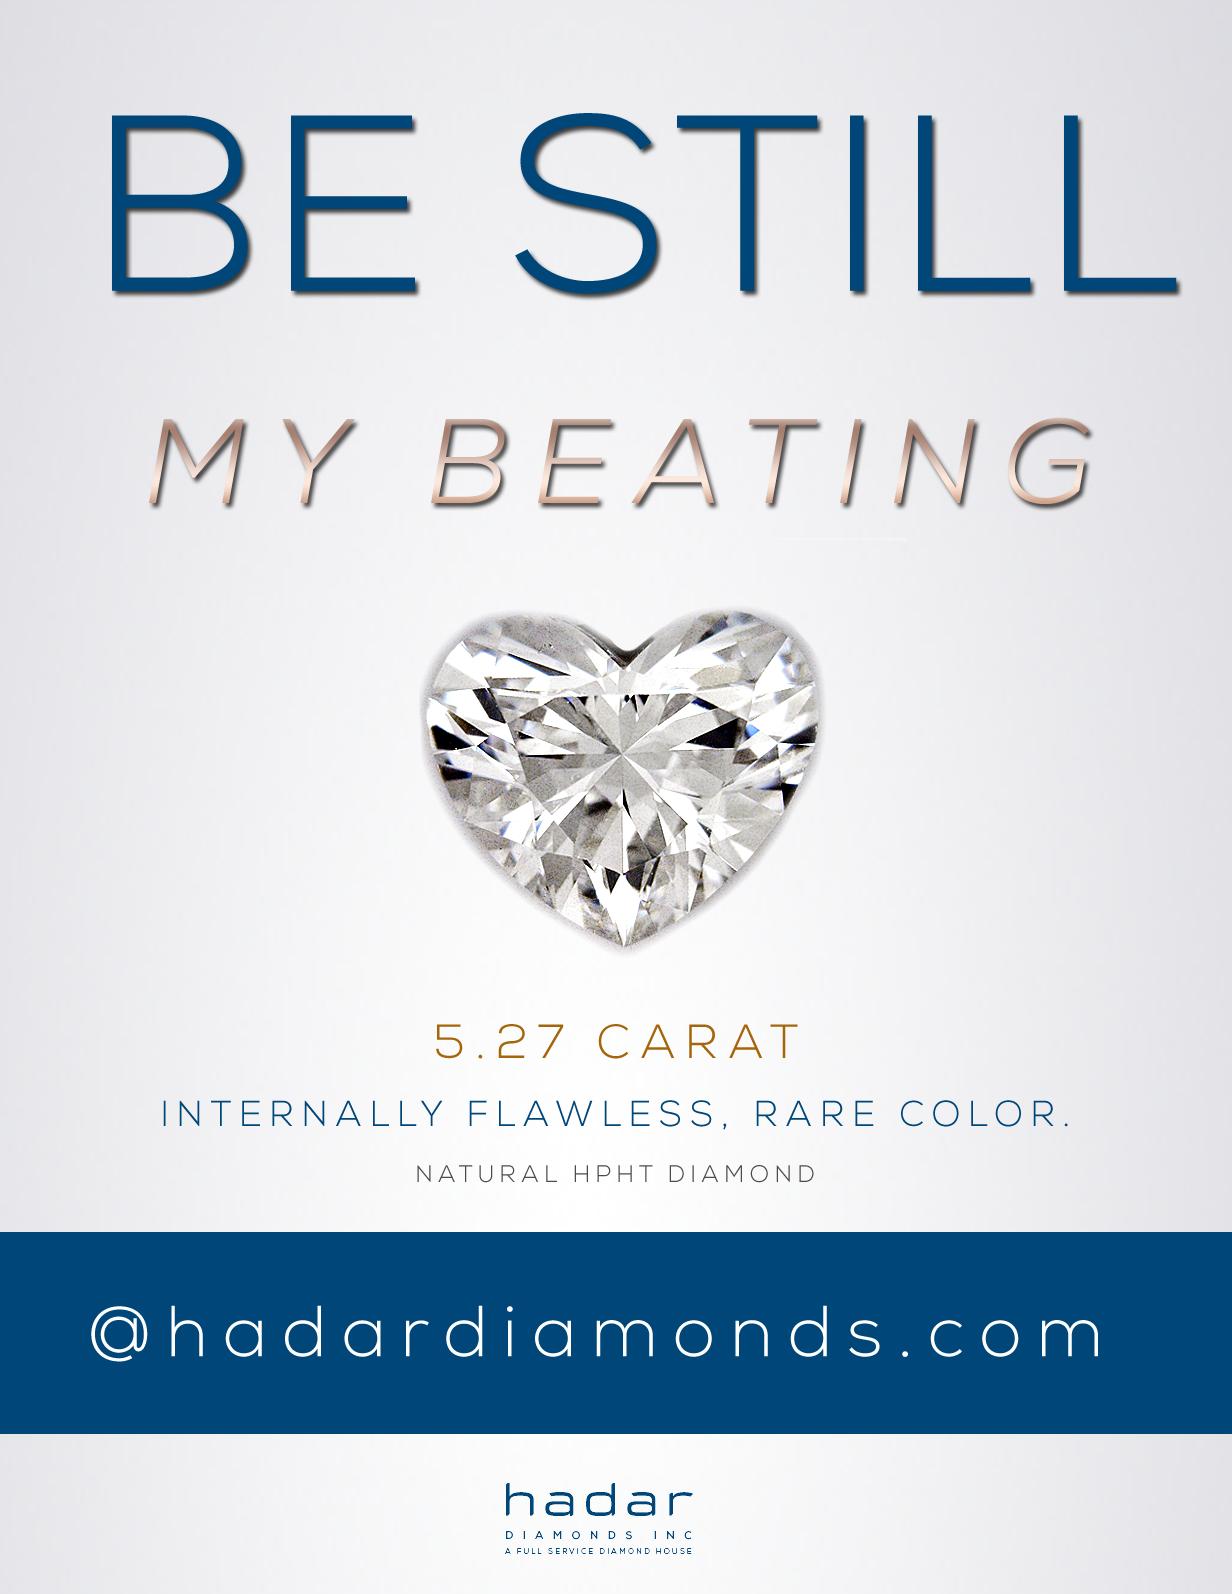 Heart Shaped Diamonds at HadarDiamonds.com | Be Still My ...